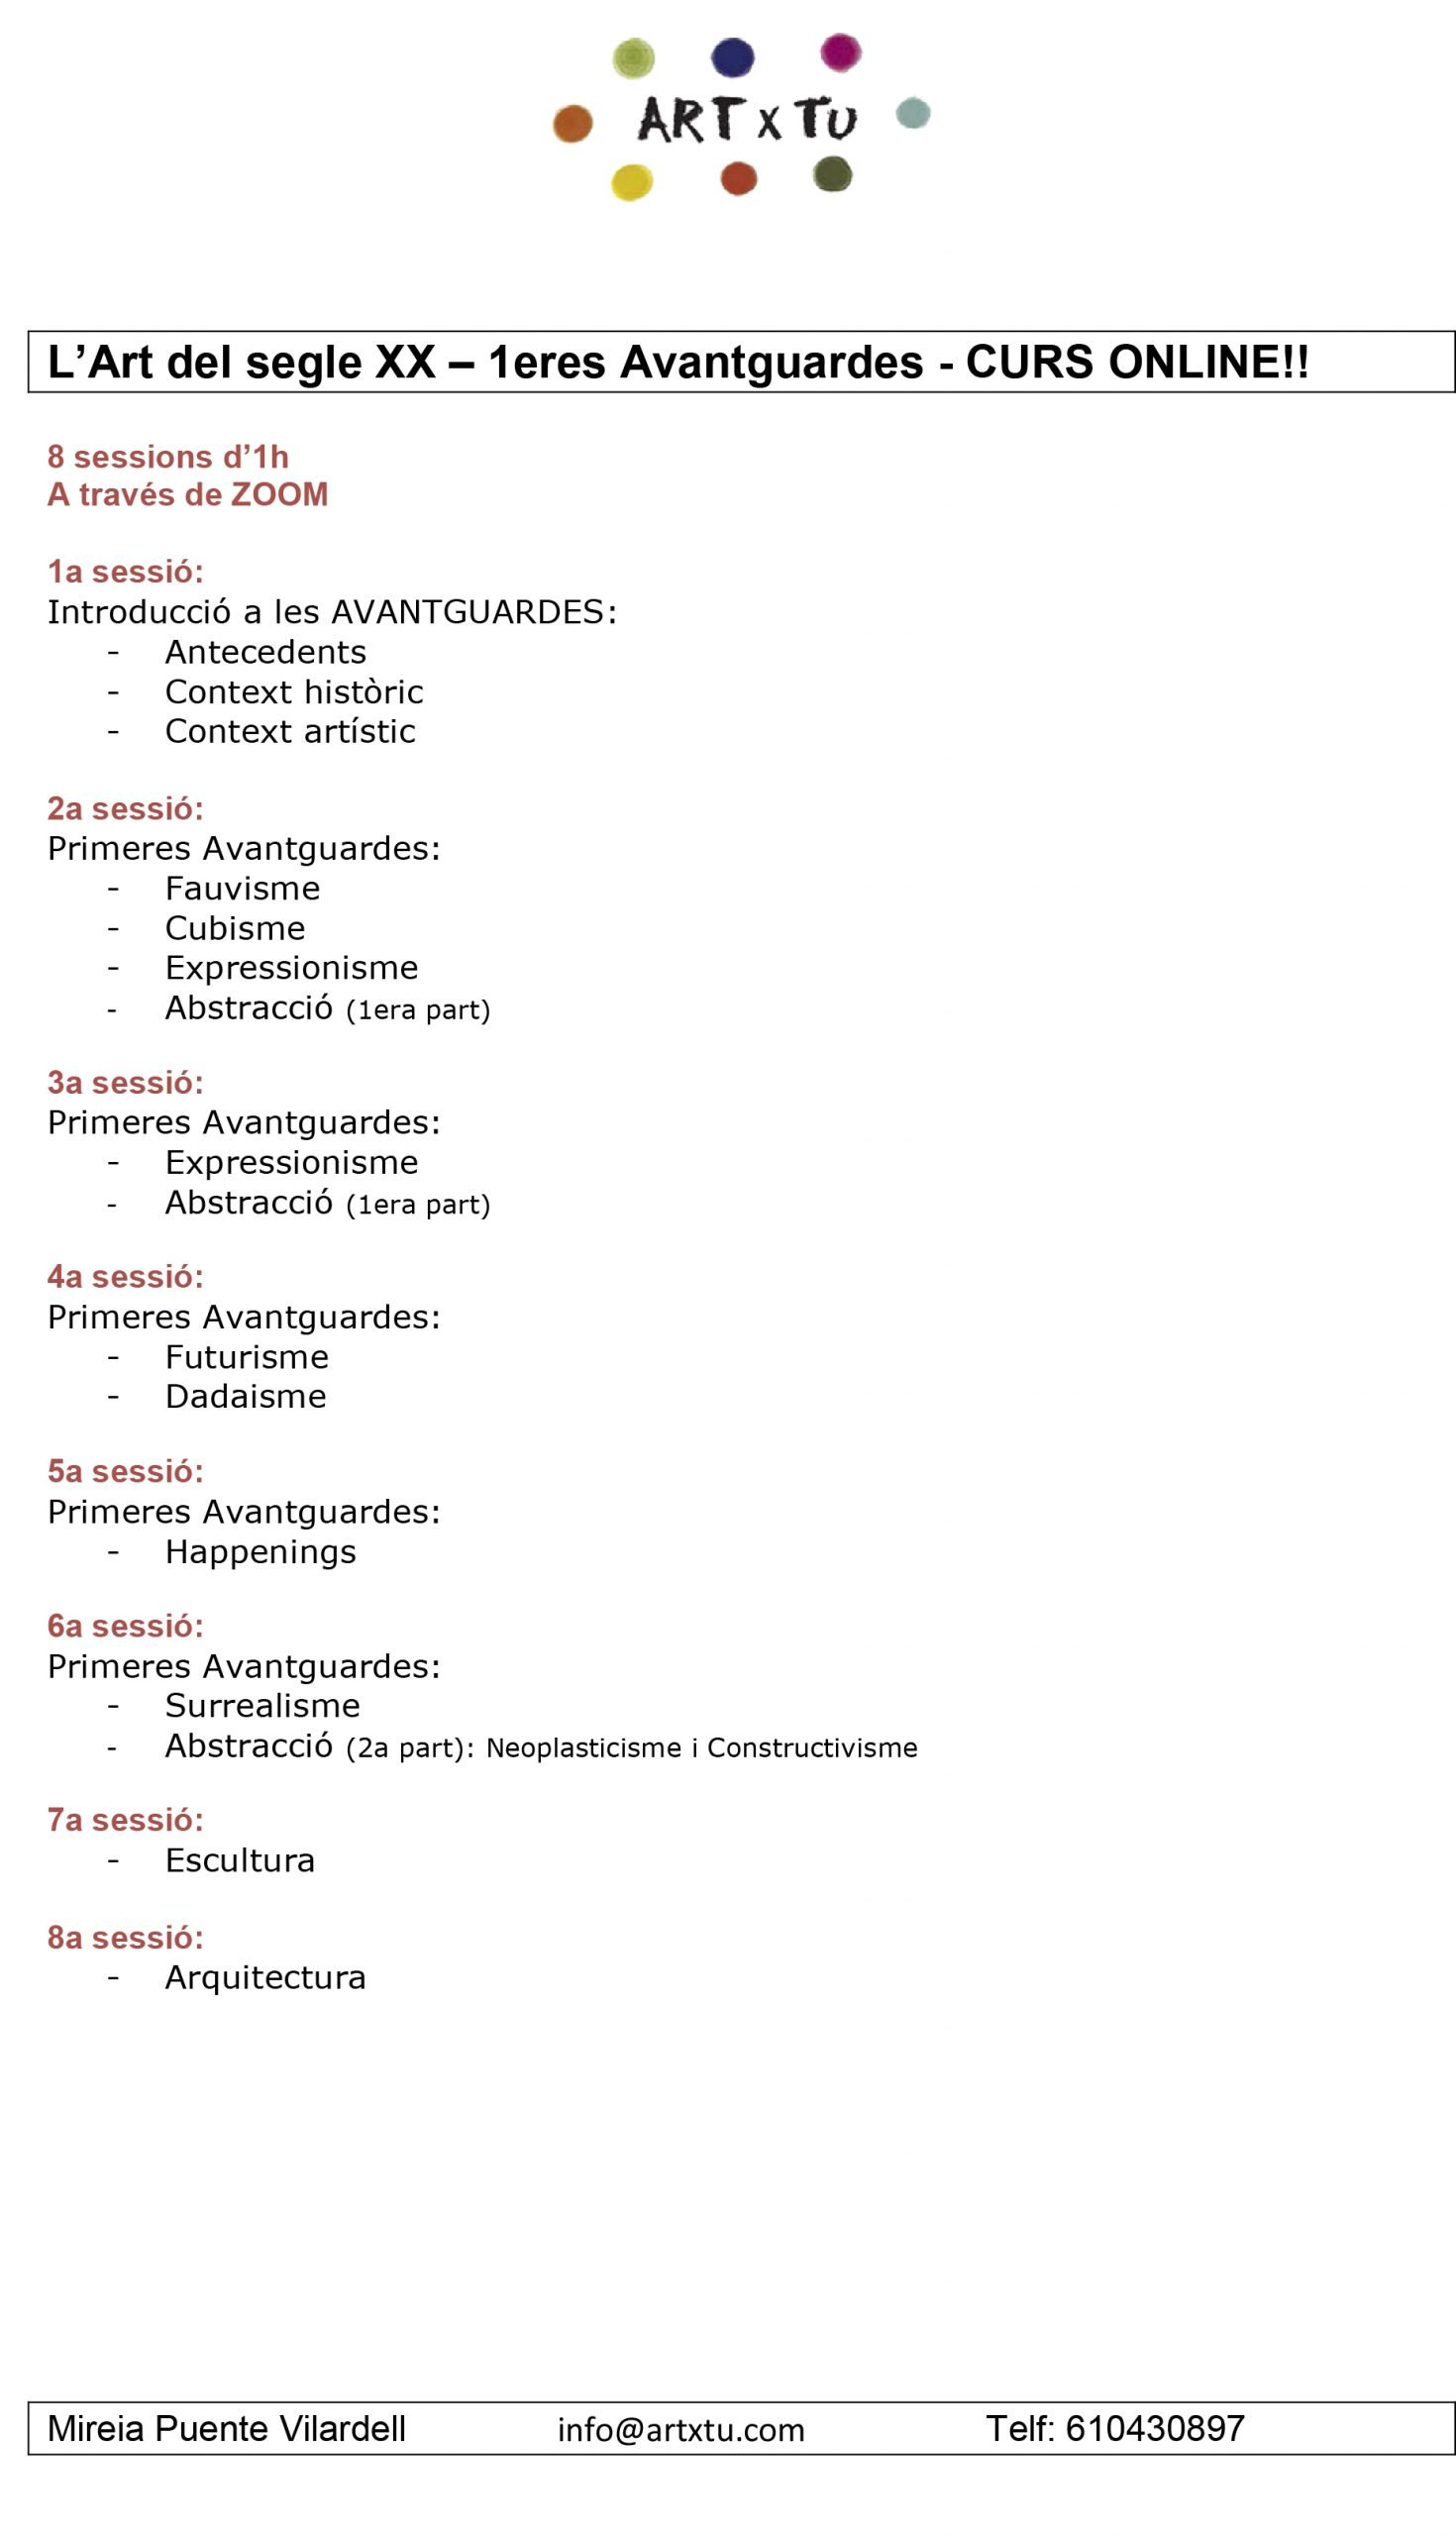 Programa-Art-del-segle-XX-1eres-Avantguardes-scaled Prueba calendario